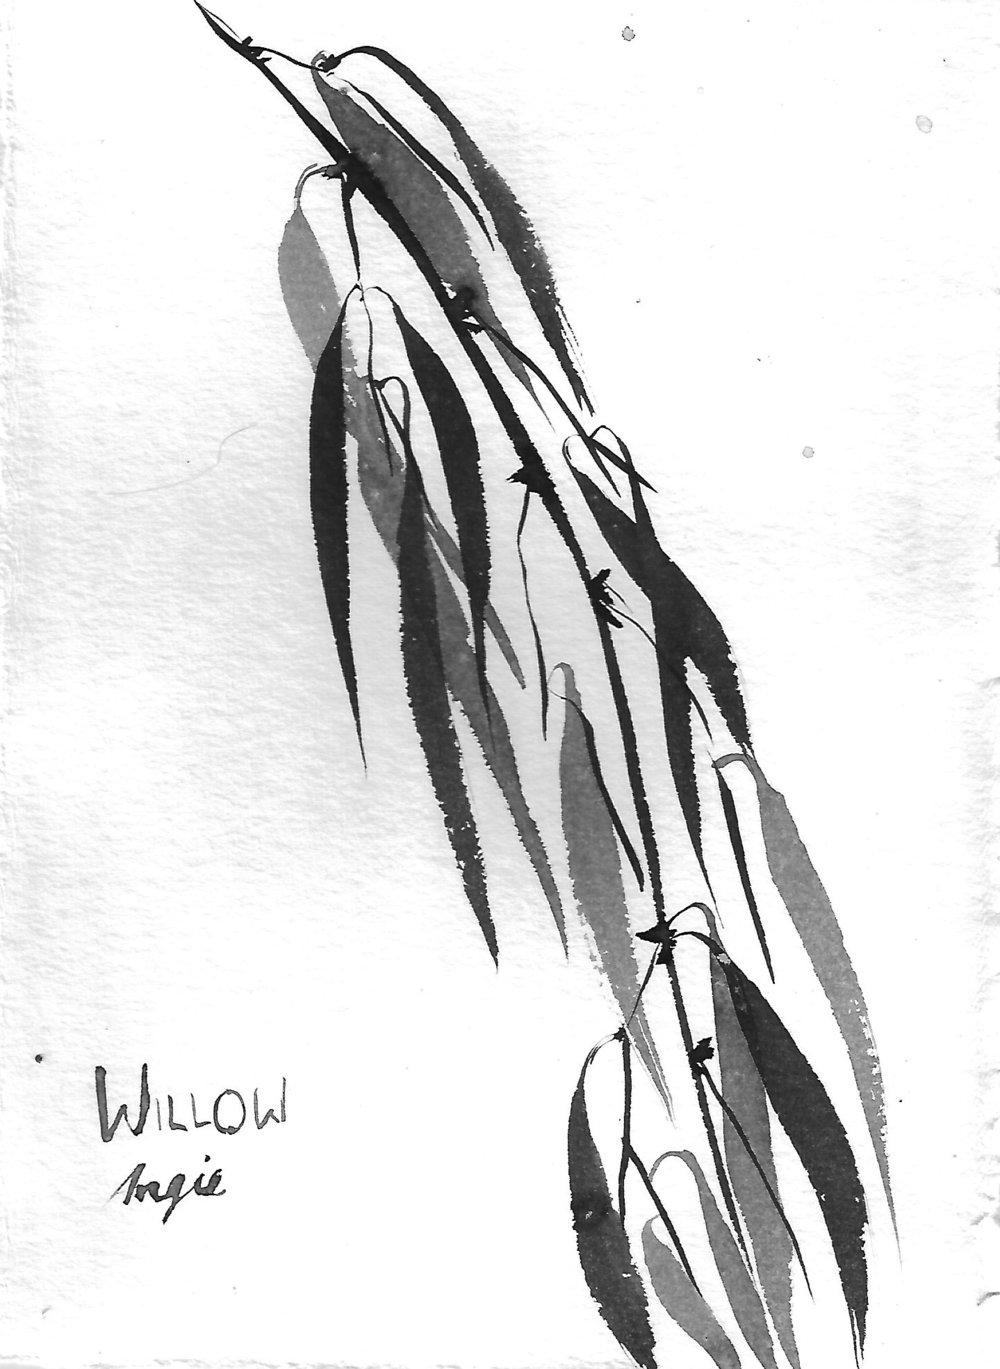 WillowBranch1.jpg